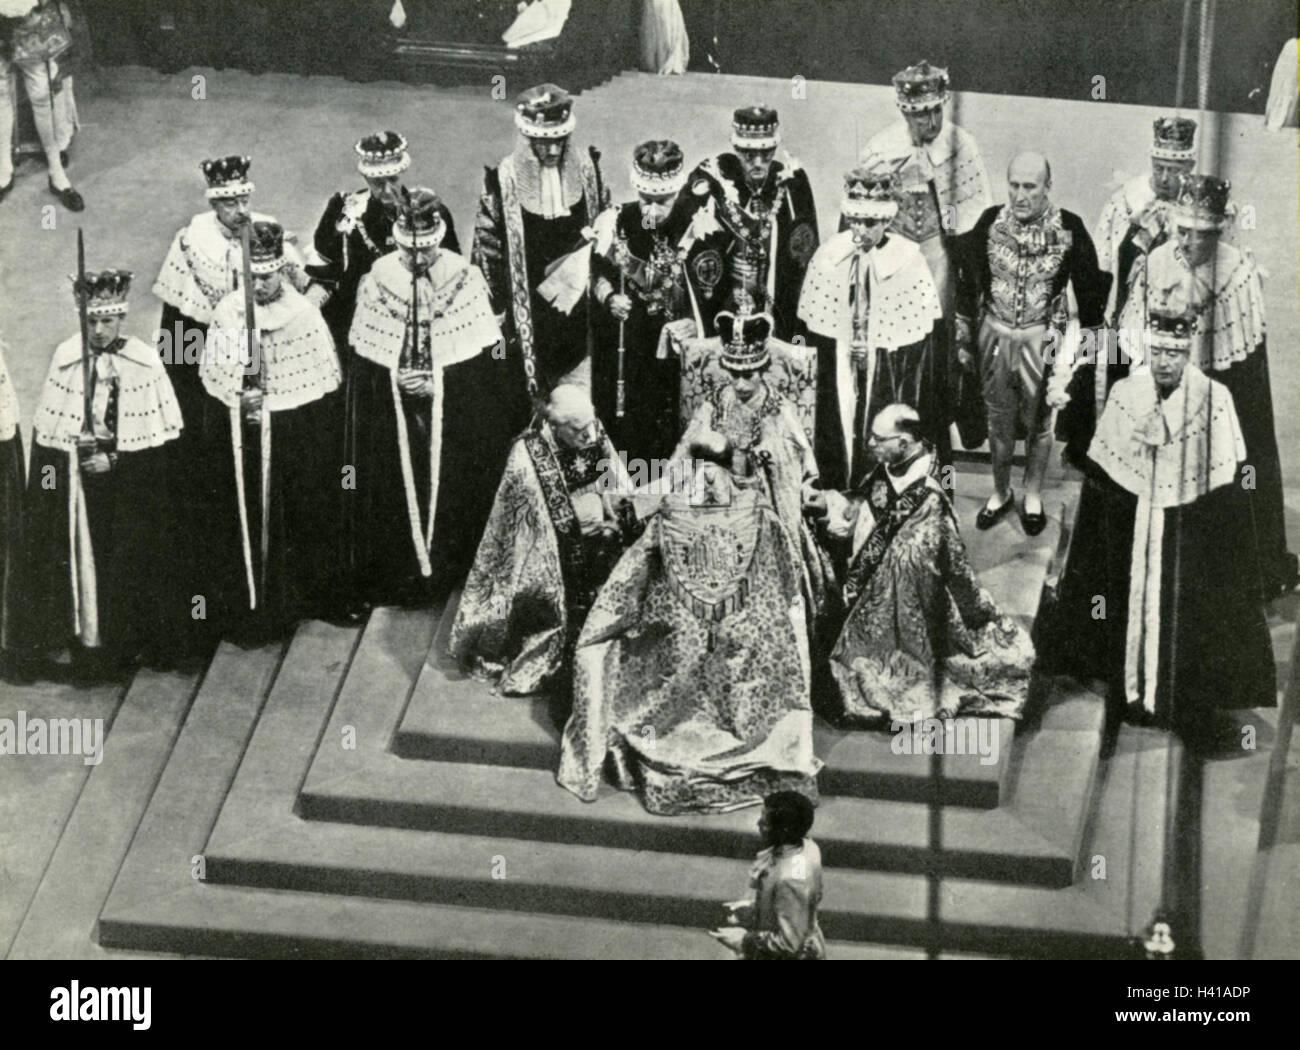 CORONATION OF QUEEN ELIZABETH II at Westminster Abbey 2 June 1953 - Stock Image